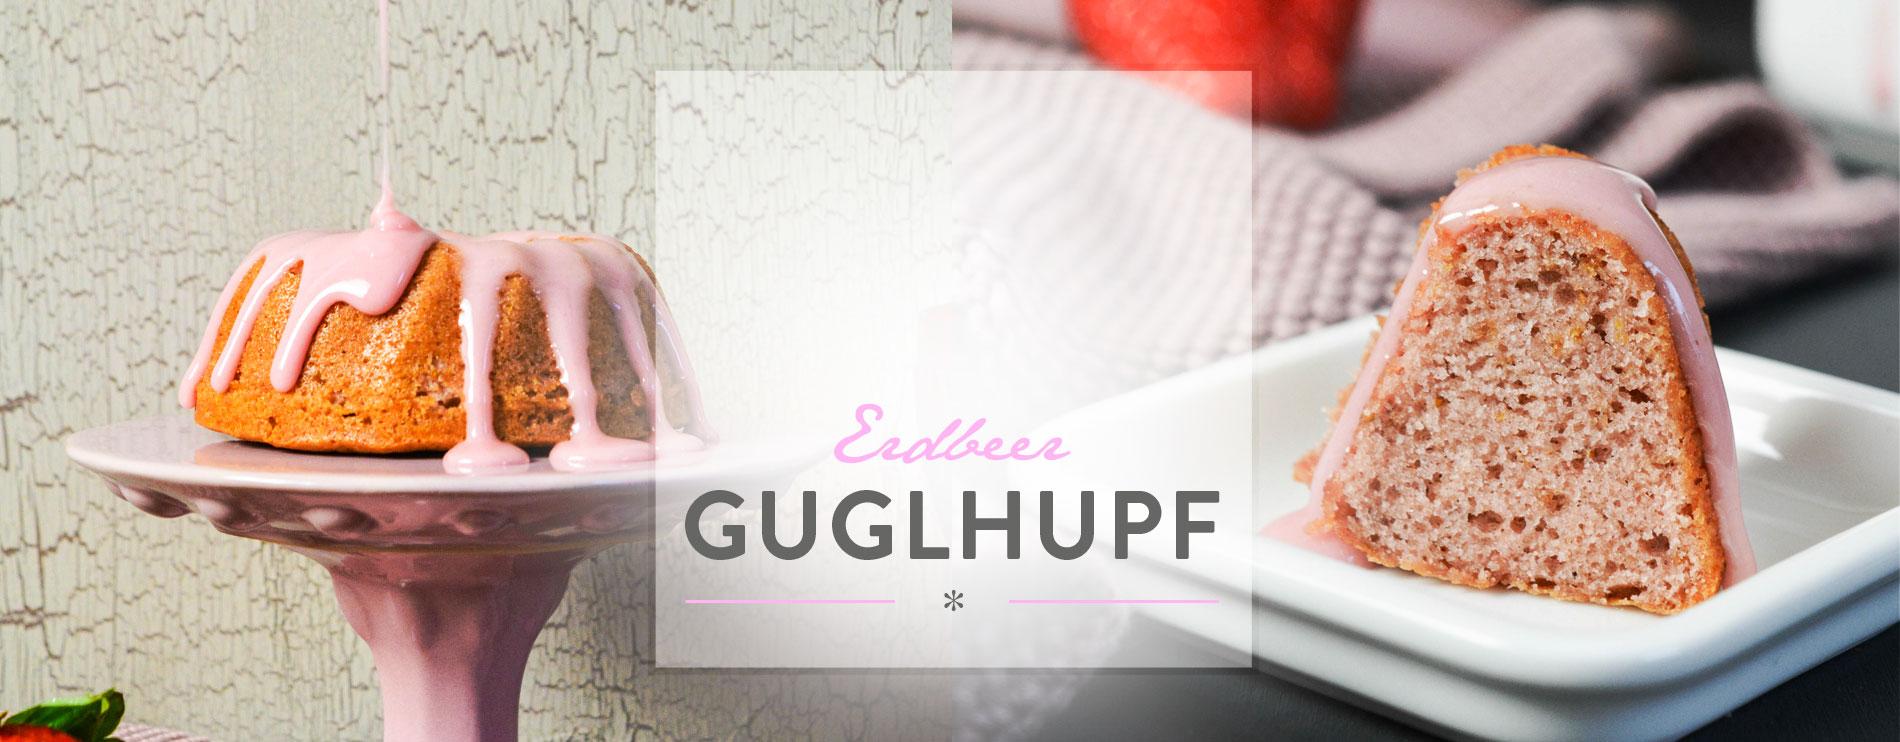 Header Erdbeer Guglhupf